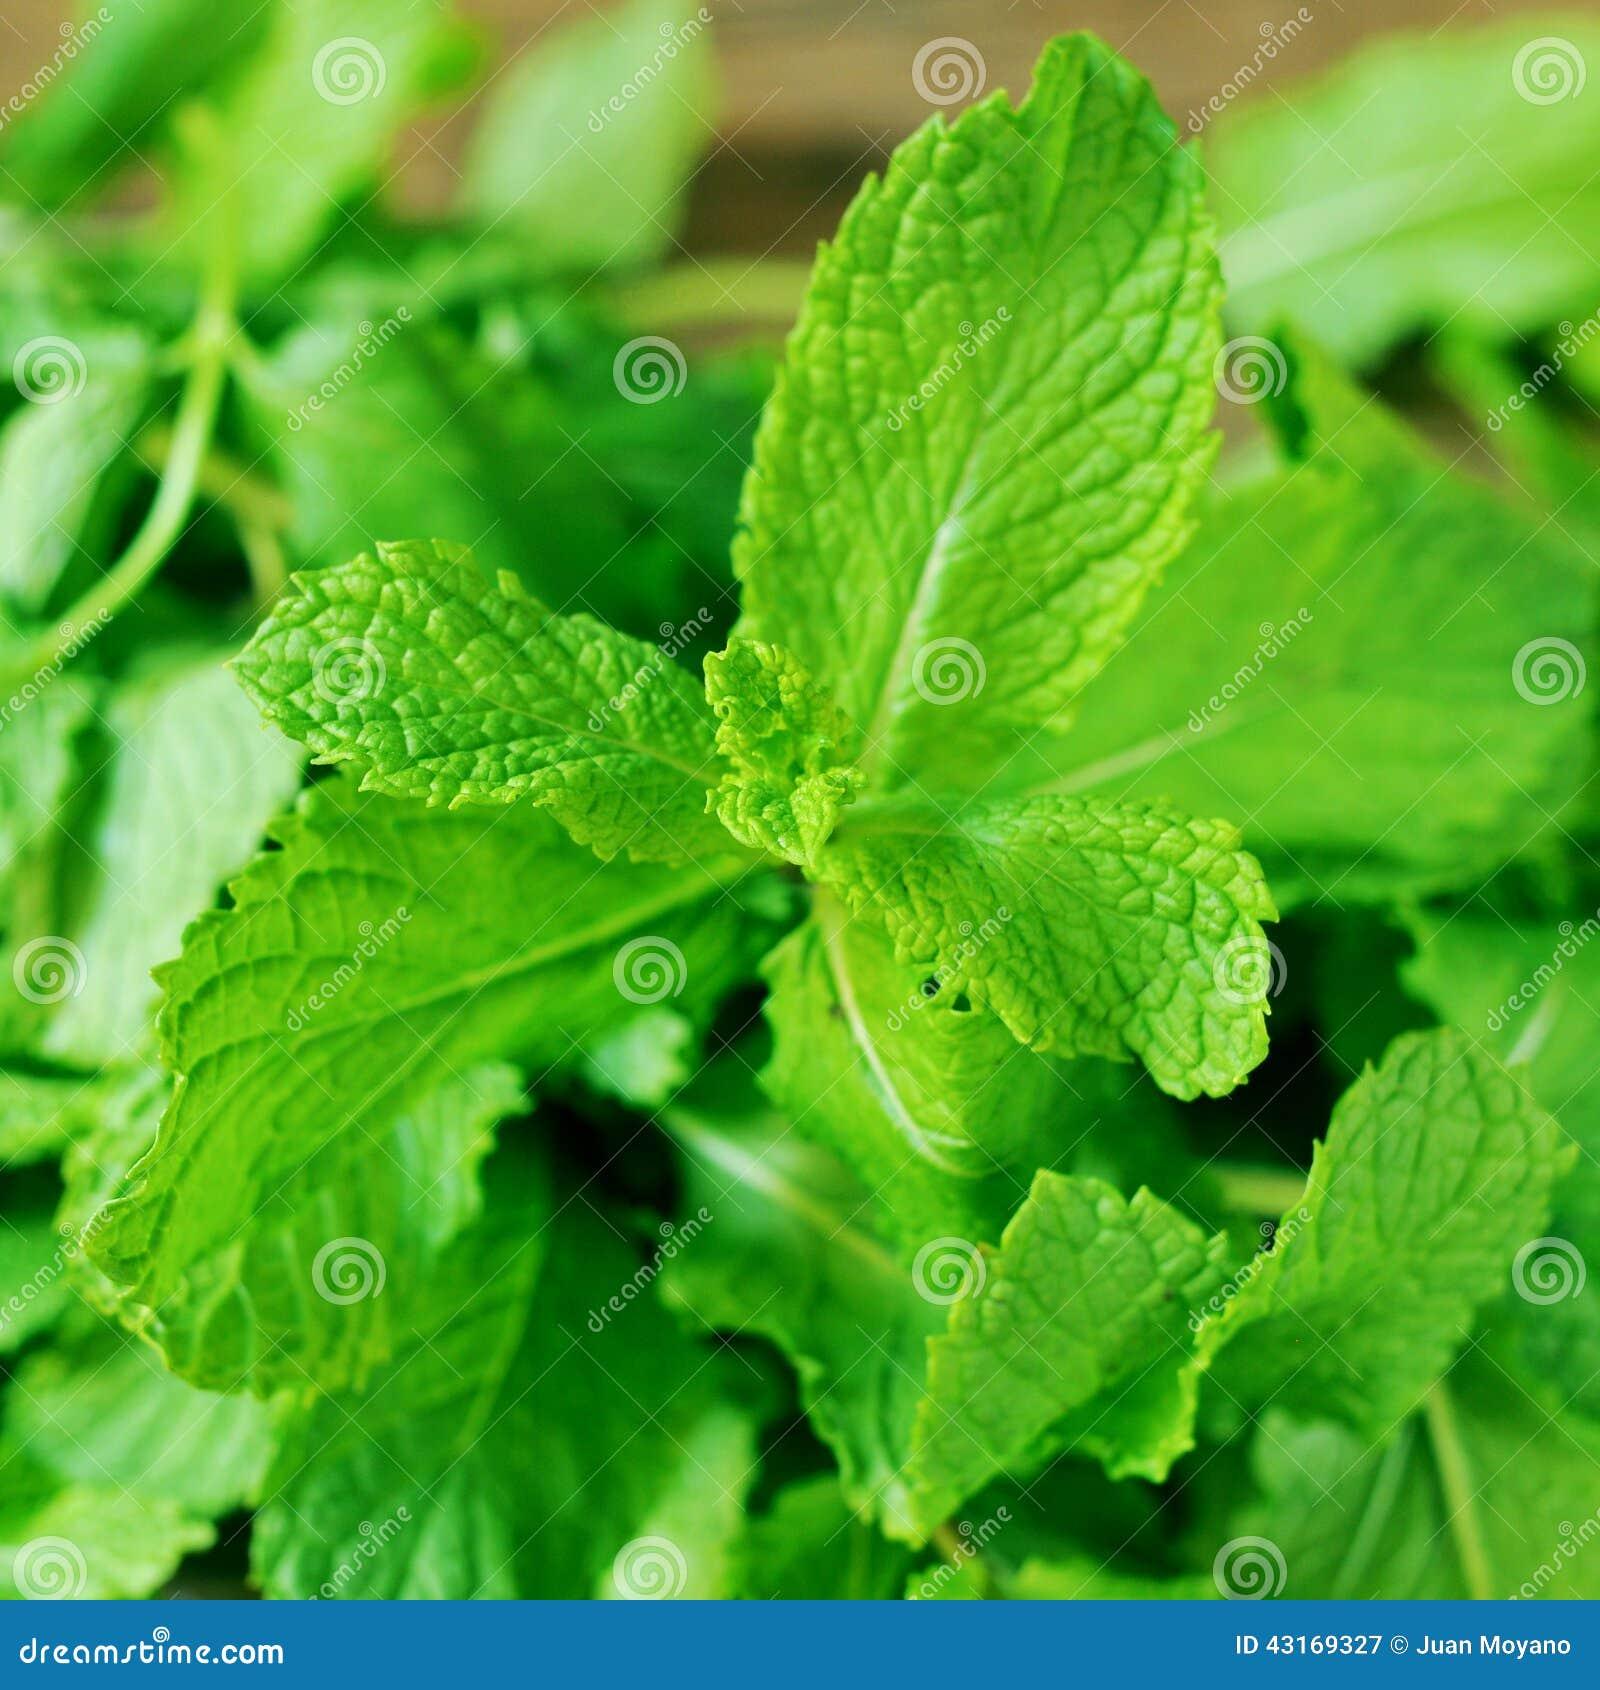 how to prepare fresh mint